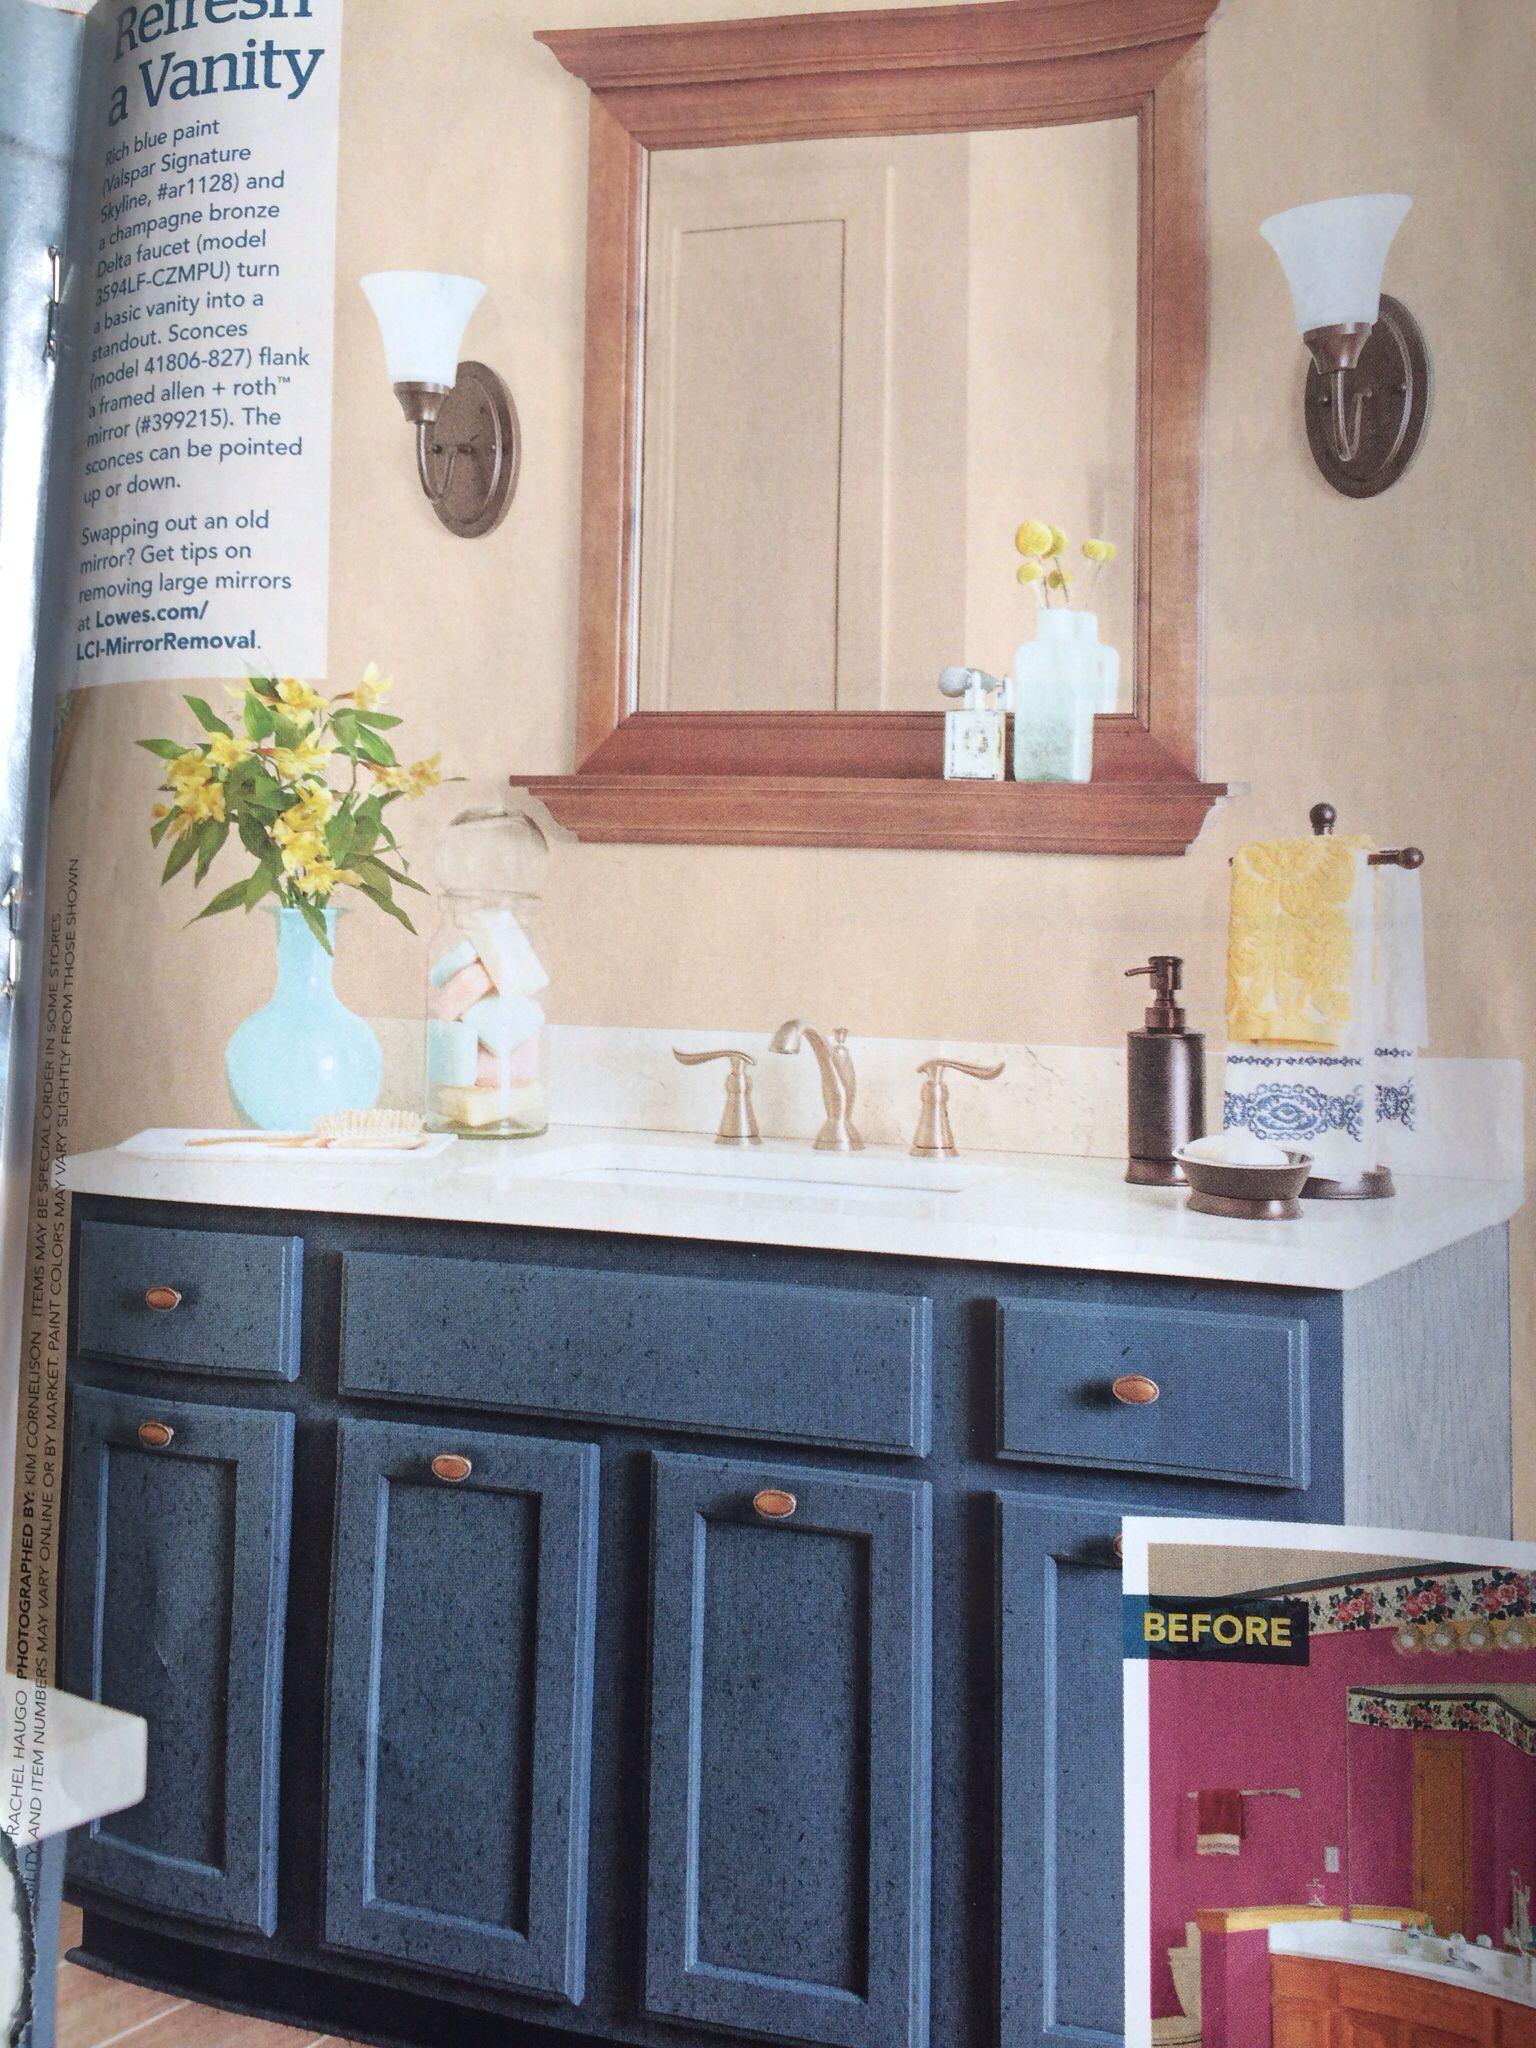 Paint 2 valspar painted cabinets beautiful valspar cabinet paint - Rich Blue Paint Valspar Signature Skyline Ar1128